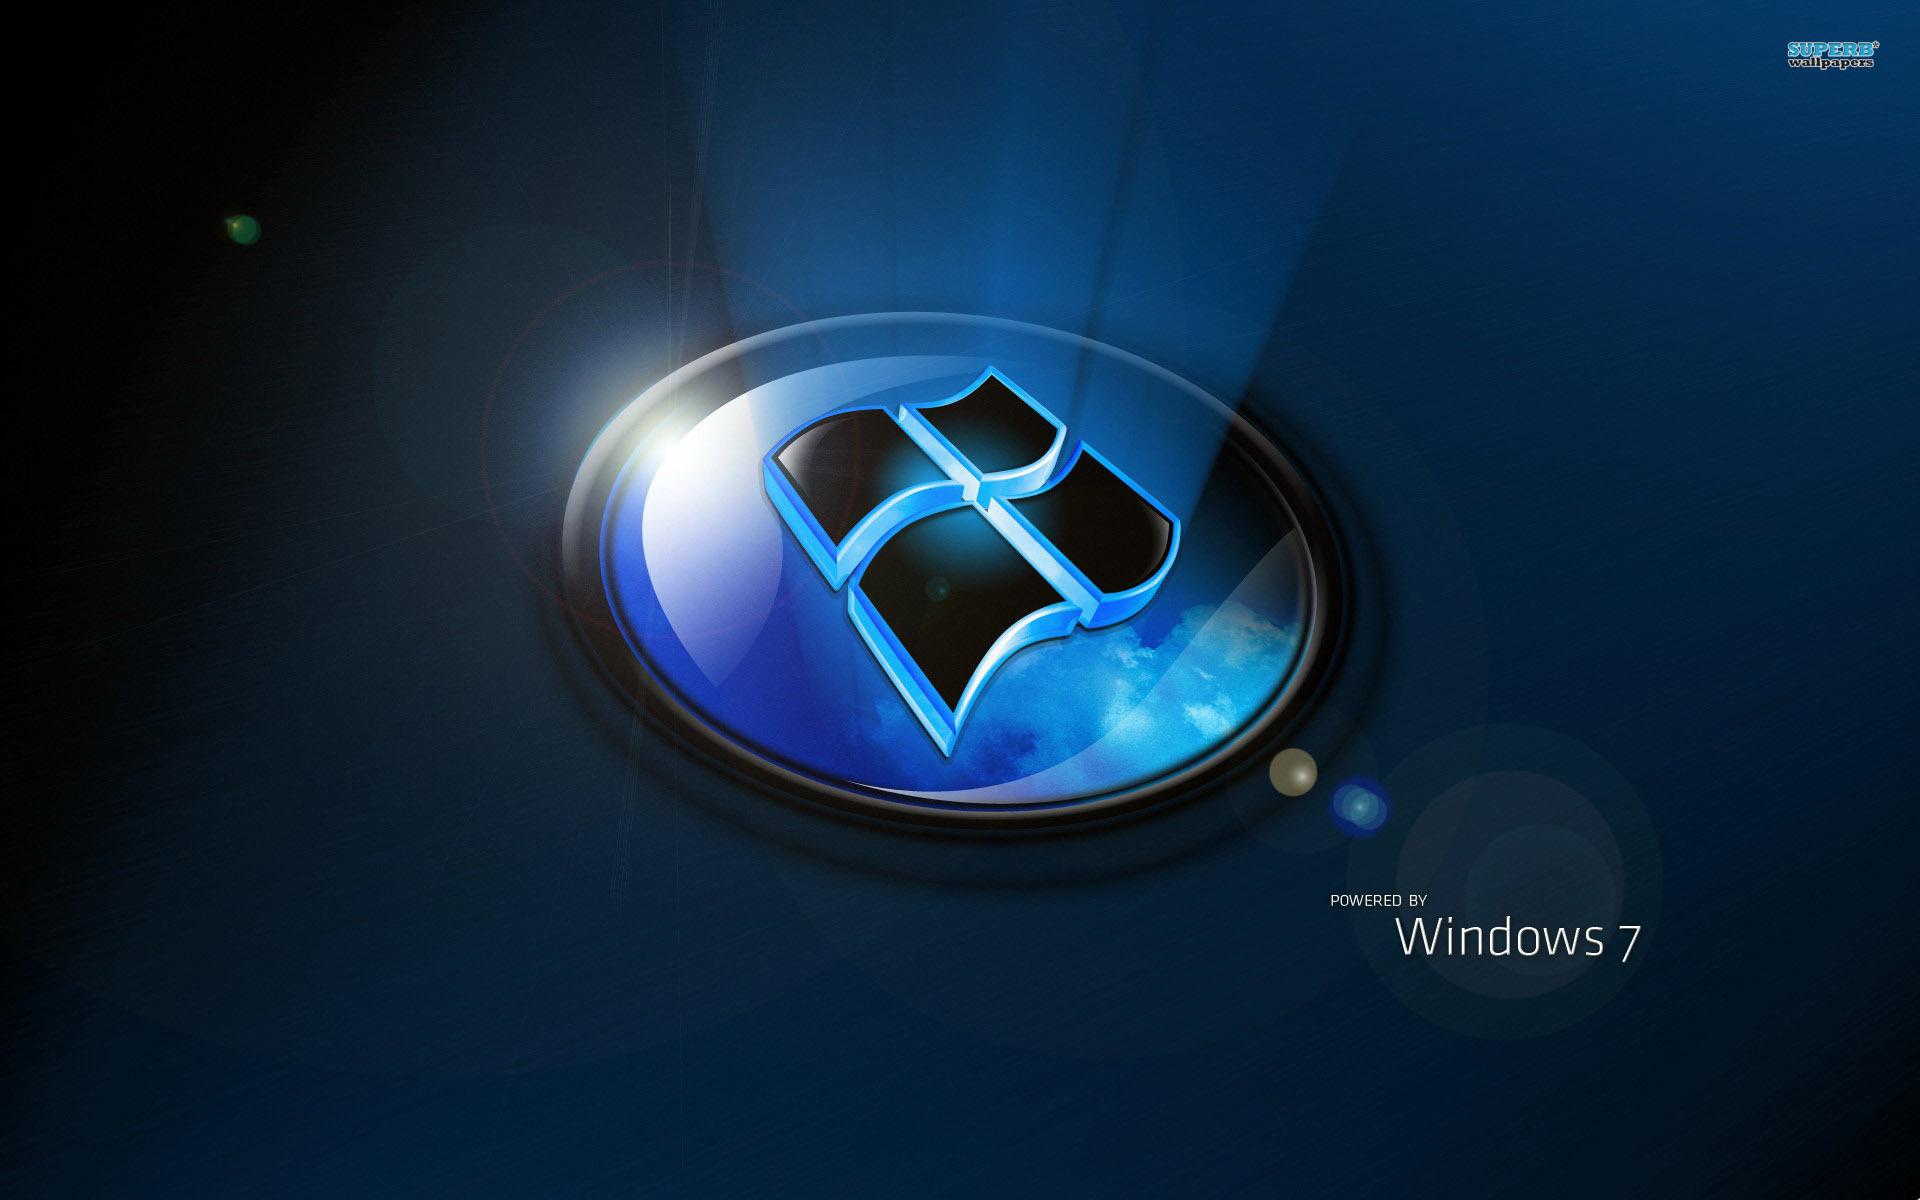 Windows 7 wallpaper 1920x1200